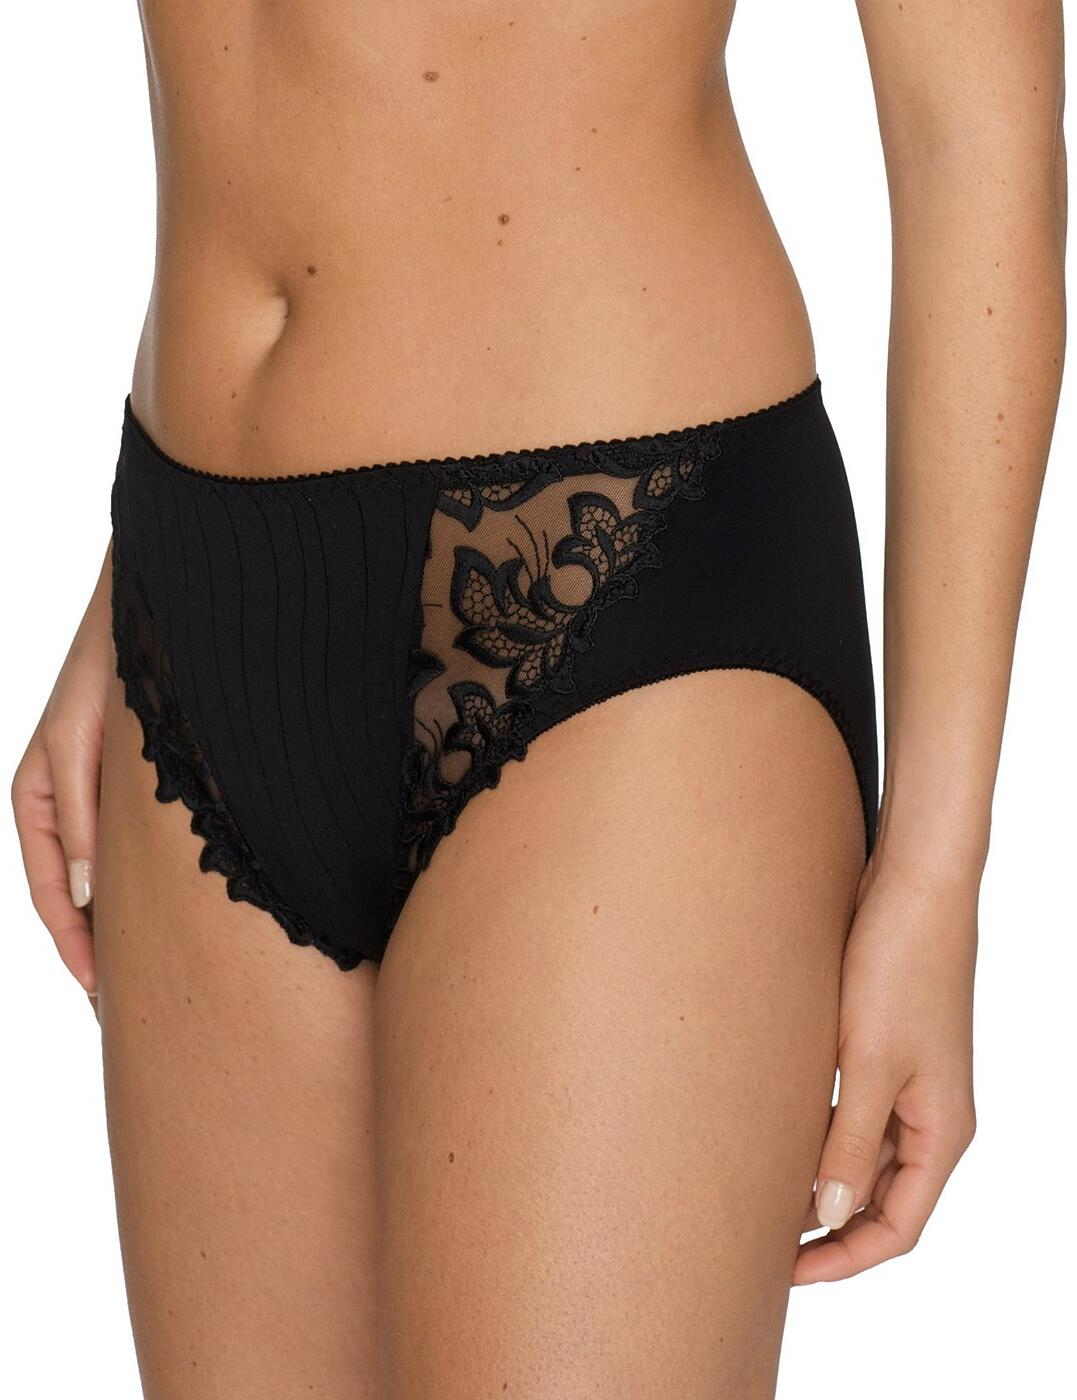 Prima-Donna-Deauville-Volle-Unterhose-Slip-Slips-Pant-0561811-Luxus-Dessous Indexbild 10